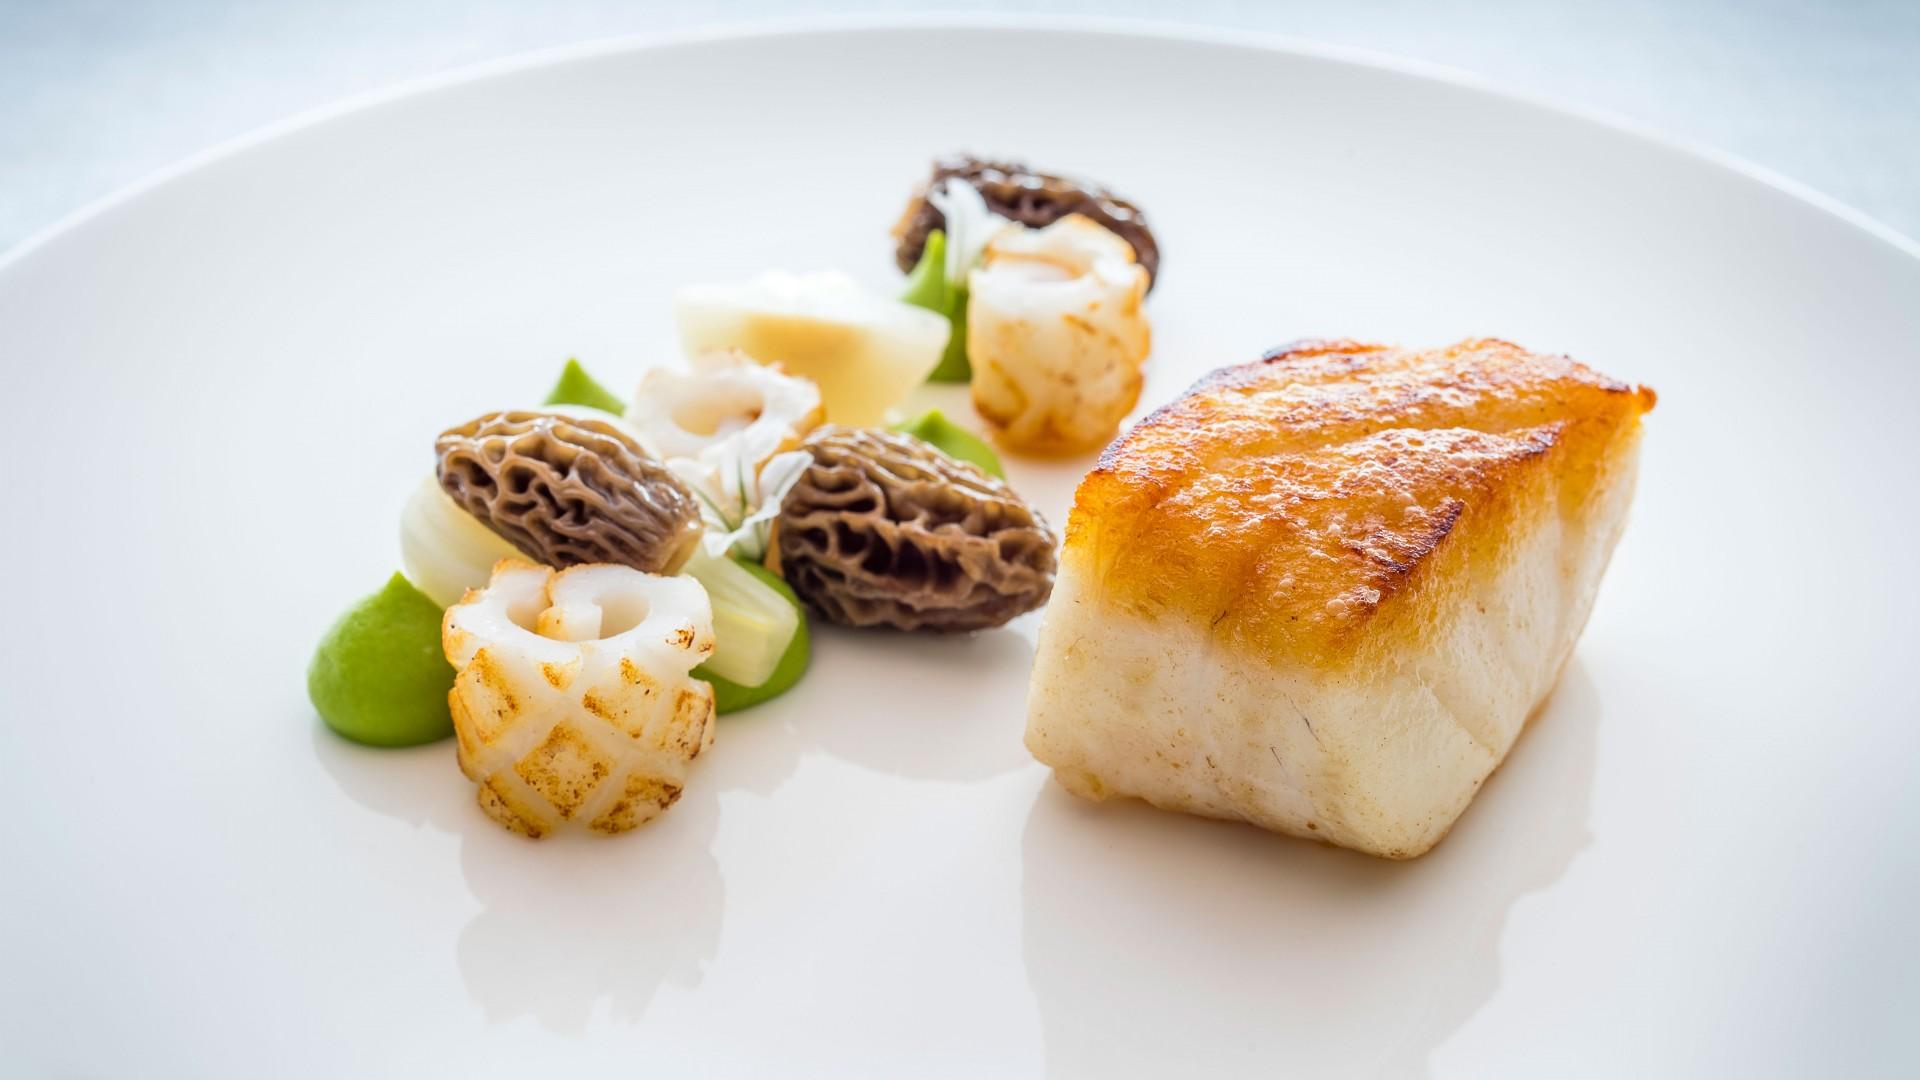 Newlyn cod, new seasons garlic, Turkish morels, line-caught squid